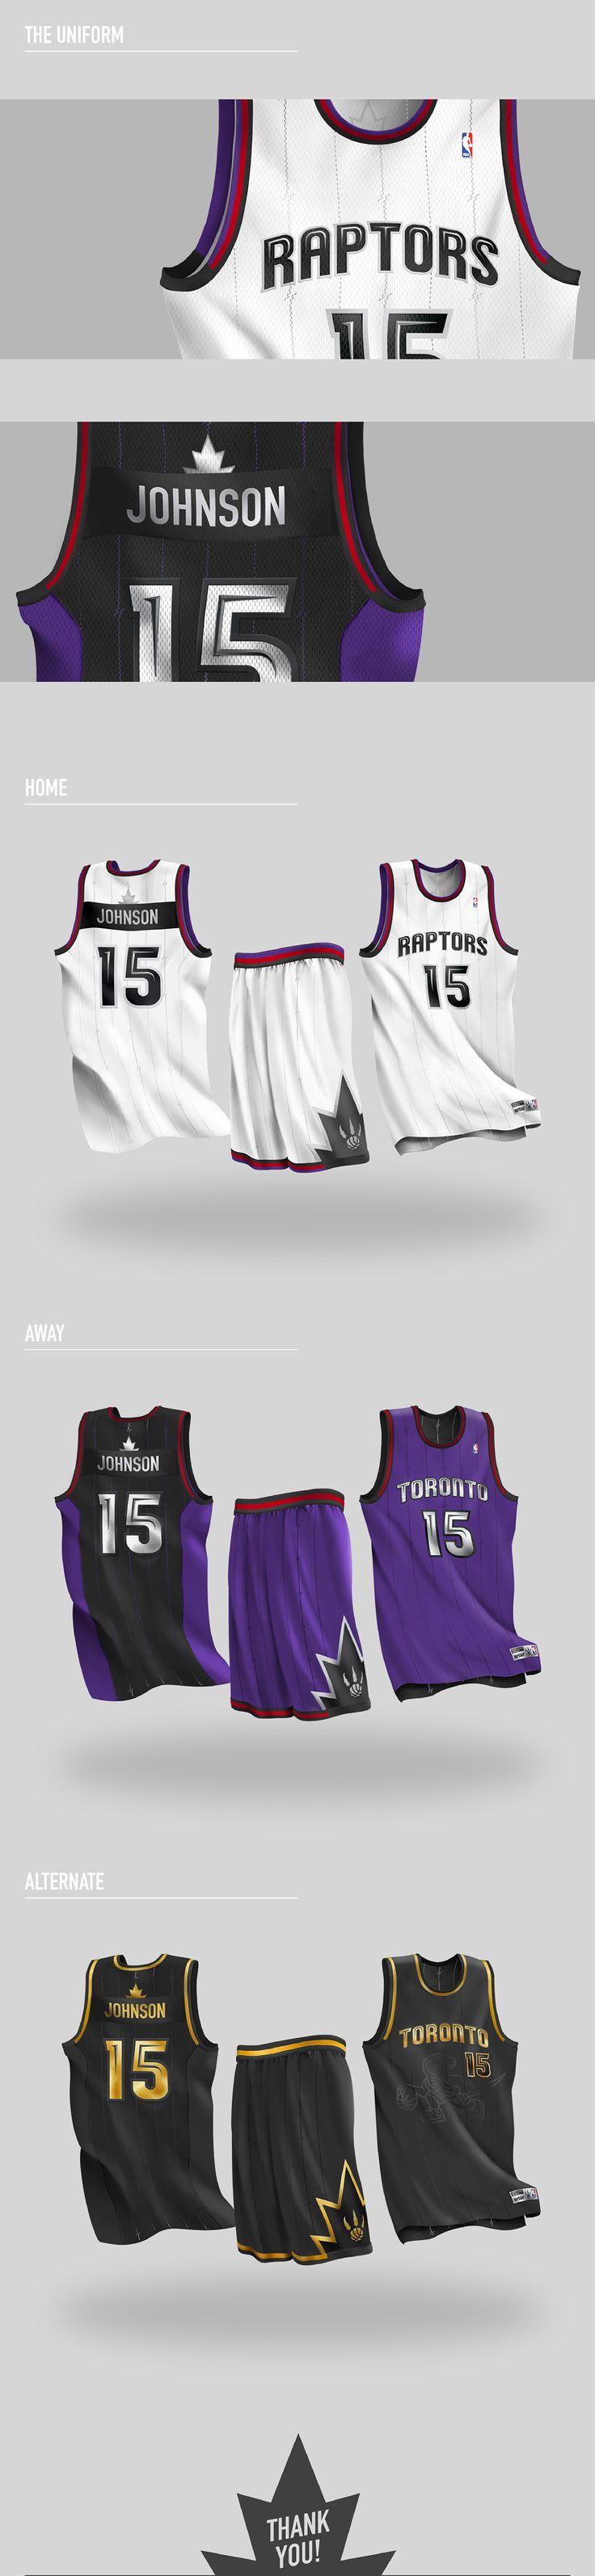 Toronto Raptors Uniform Concept on Behance